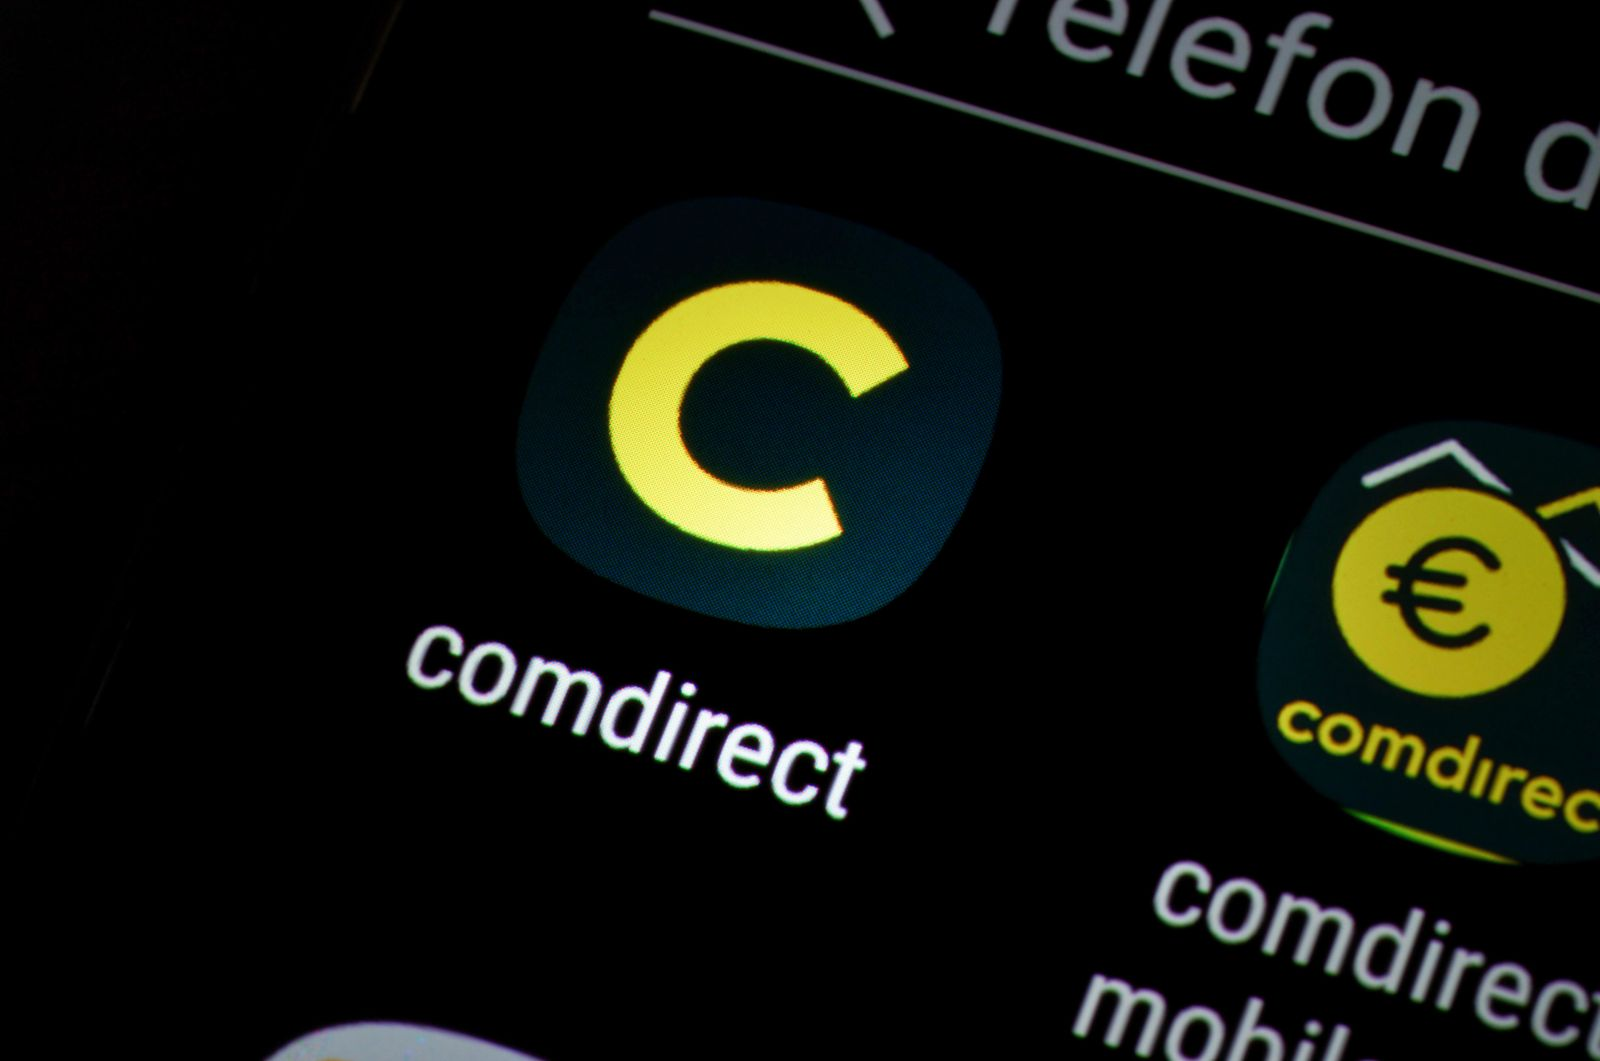 Smartphone Display App comdirect